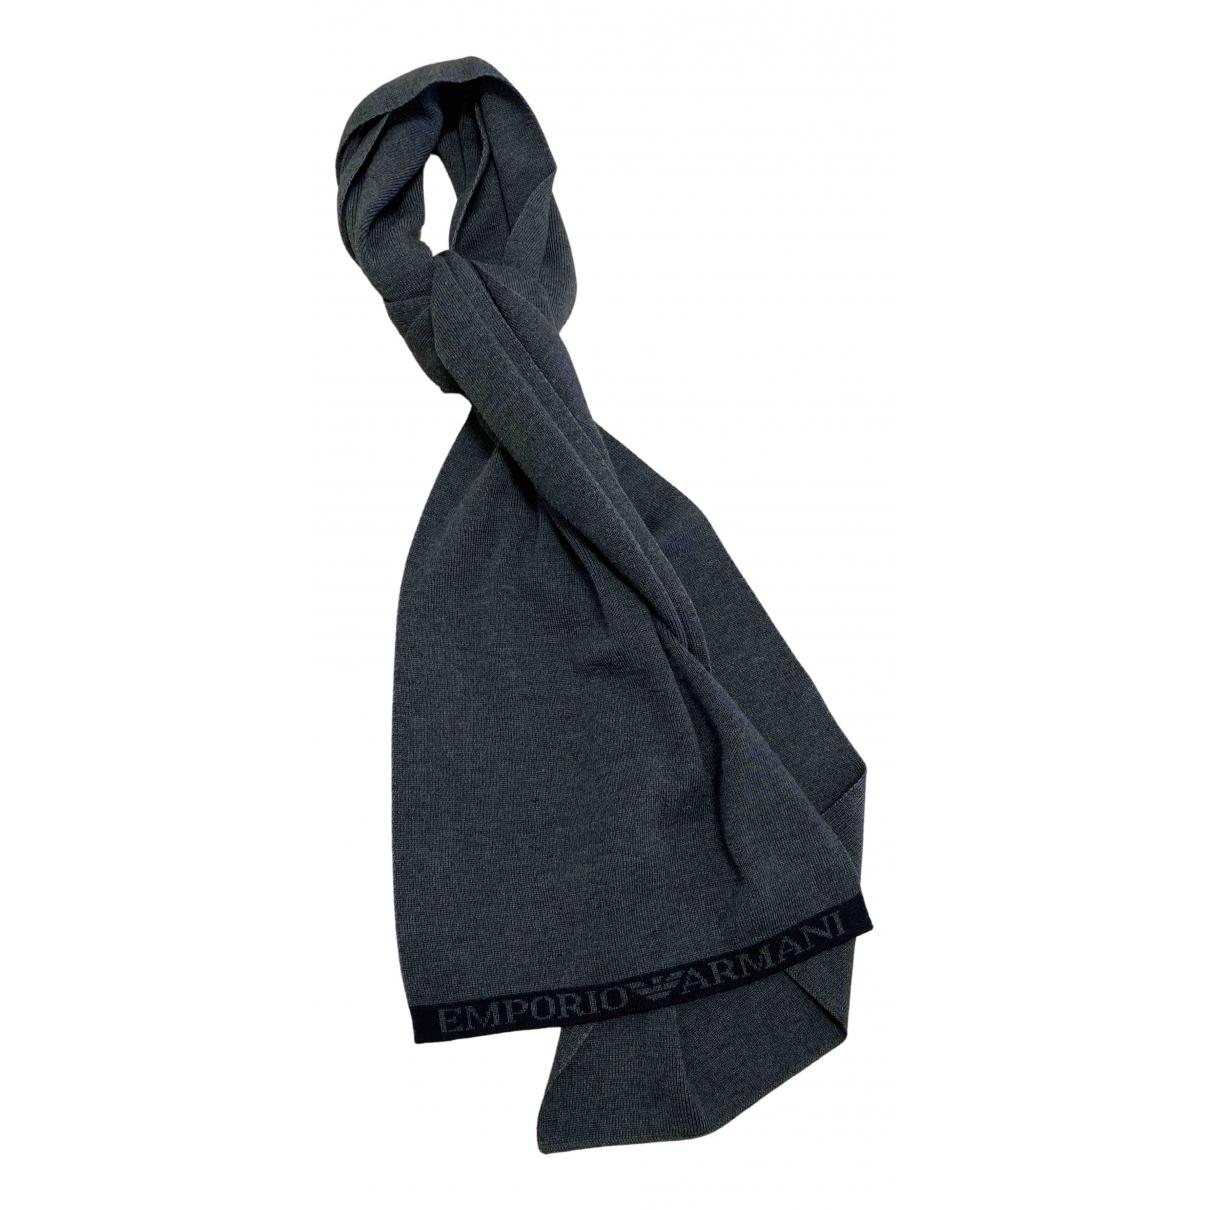 Pañuelo / bufanda de Lana Emporio Armani